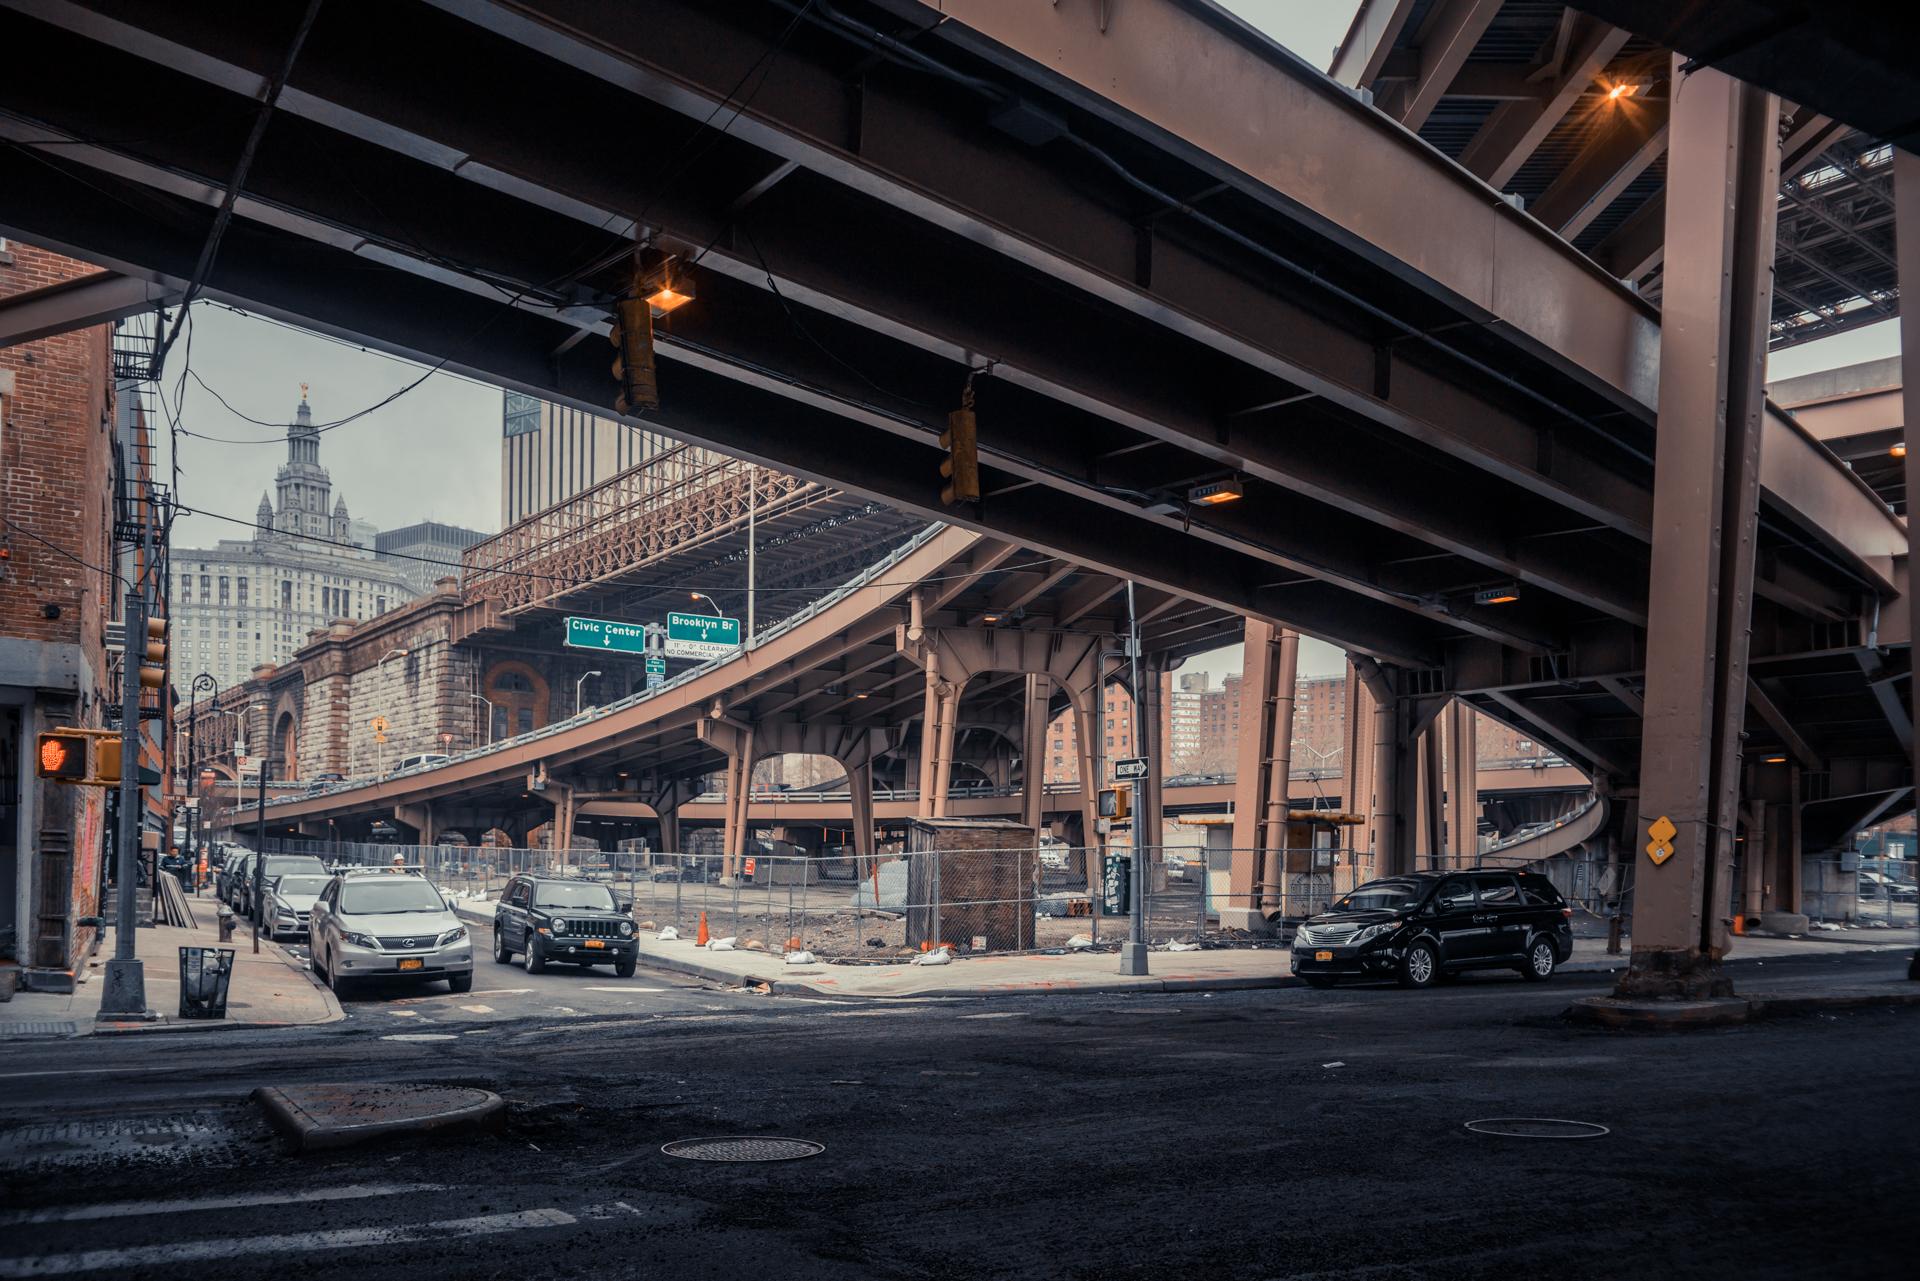 NYC_stijn_hoekstra-39.jpg